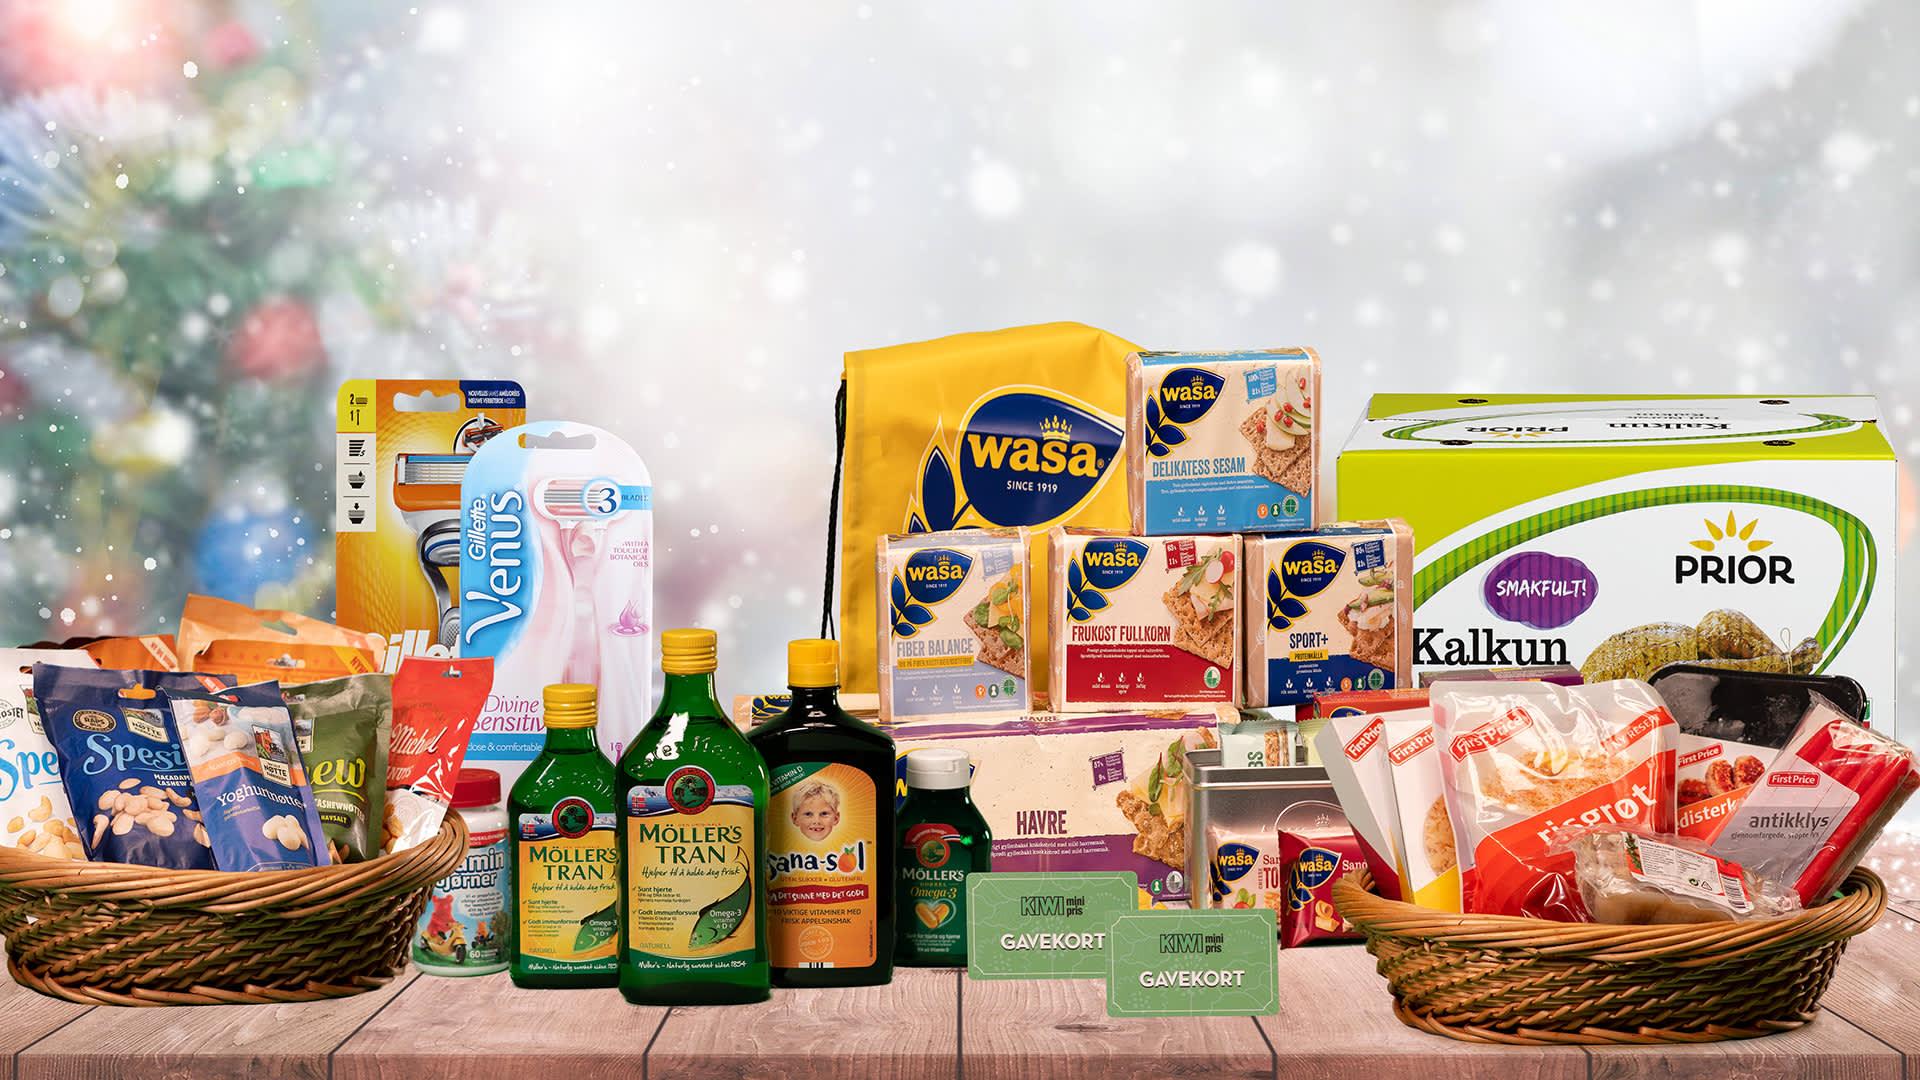 Gillette, Venus, Den lille nøttefabrikken, KIWI, Wasa, Möller's, Collett, Prior, First Price, Fjordland